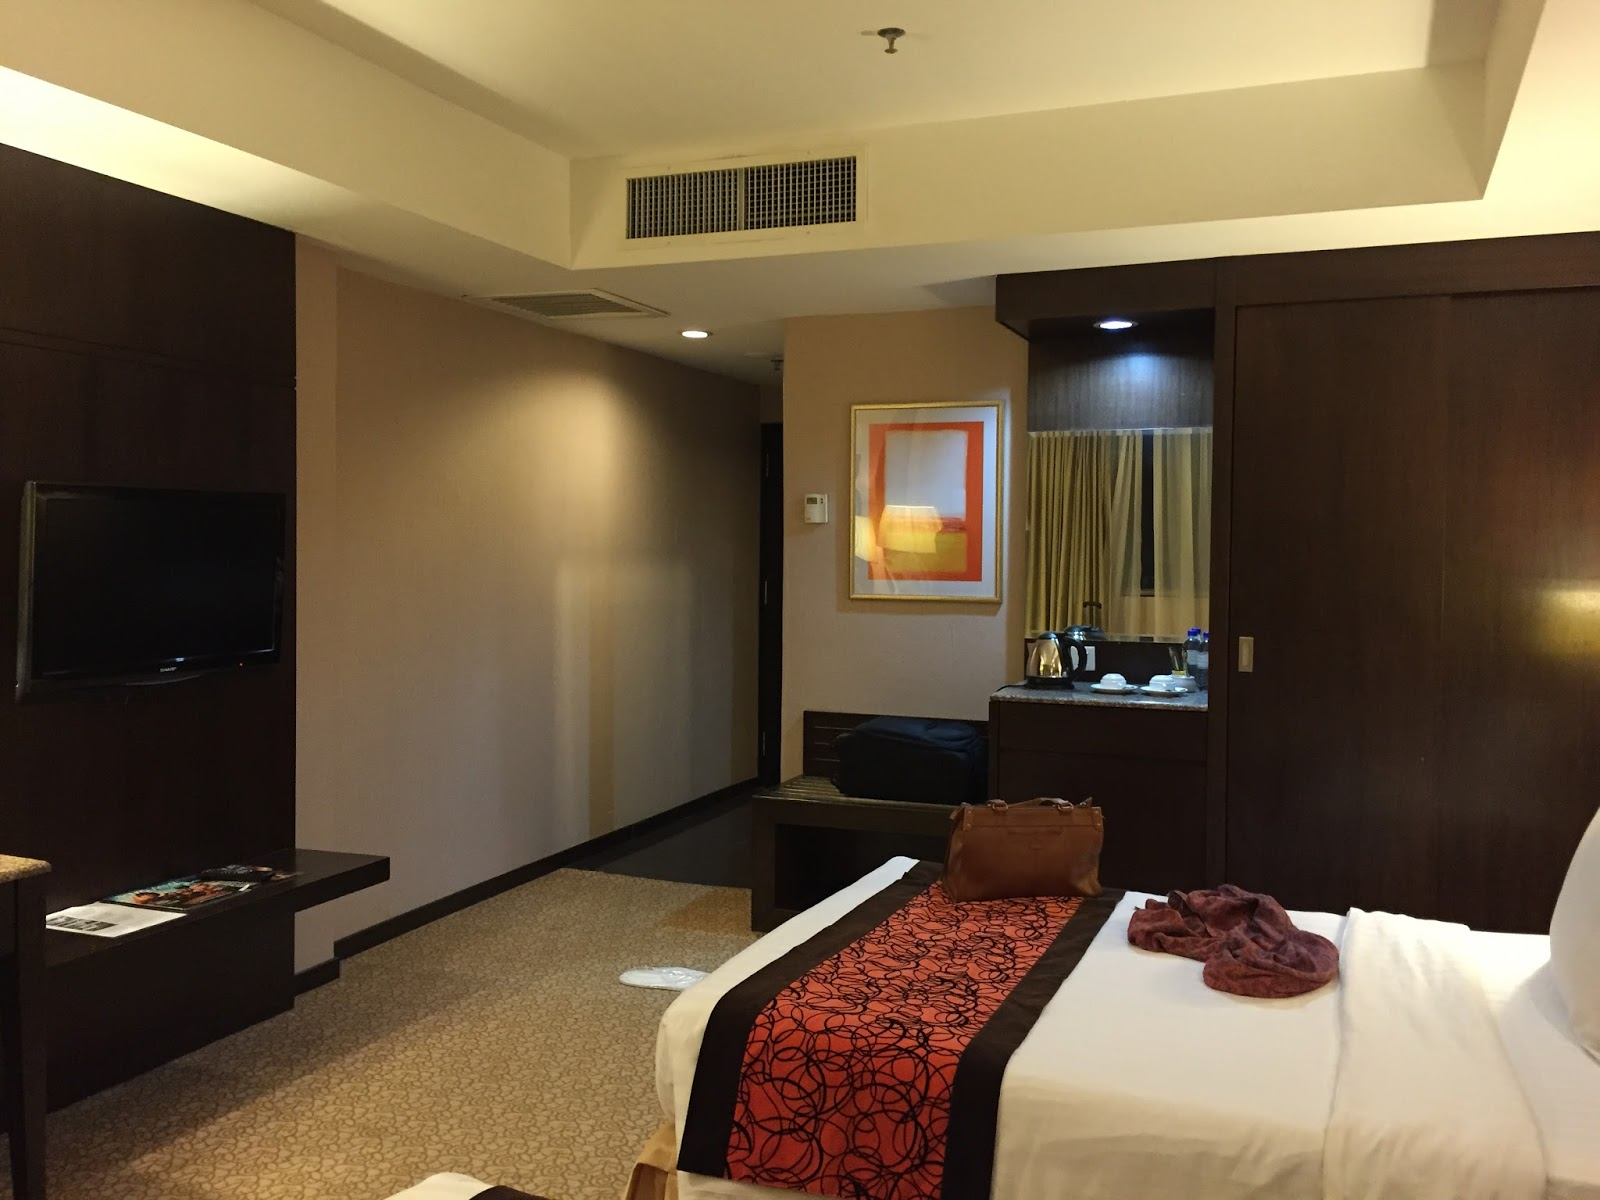 Hotel Sentral Johor Bahru 16 Hotel Di Johor Bahru Berdekatan Singapura Imigrasi Mall Jb